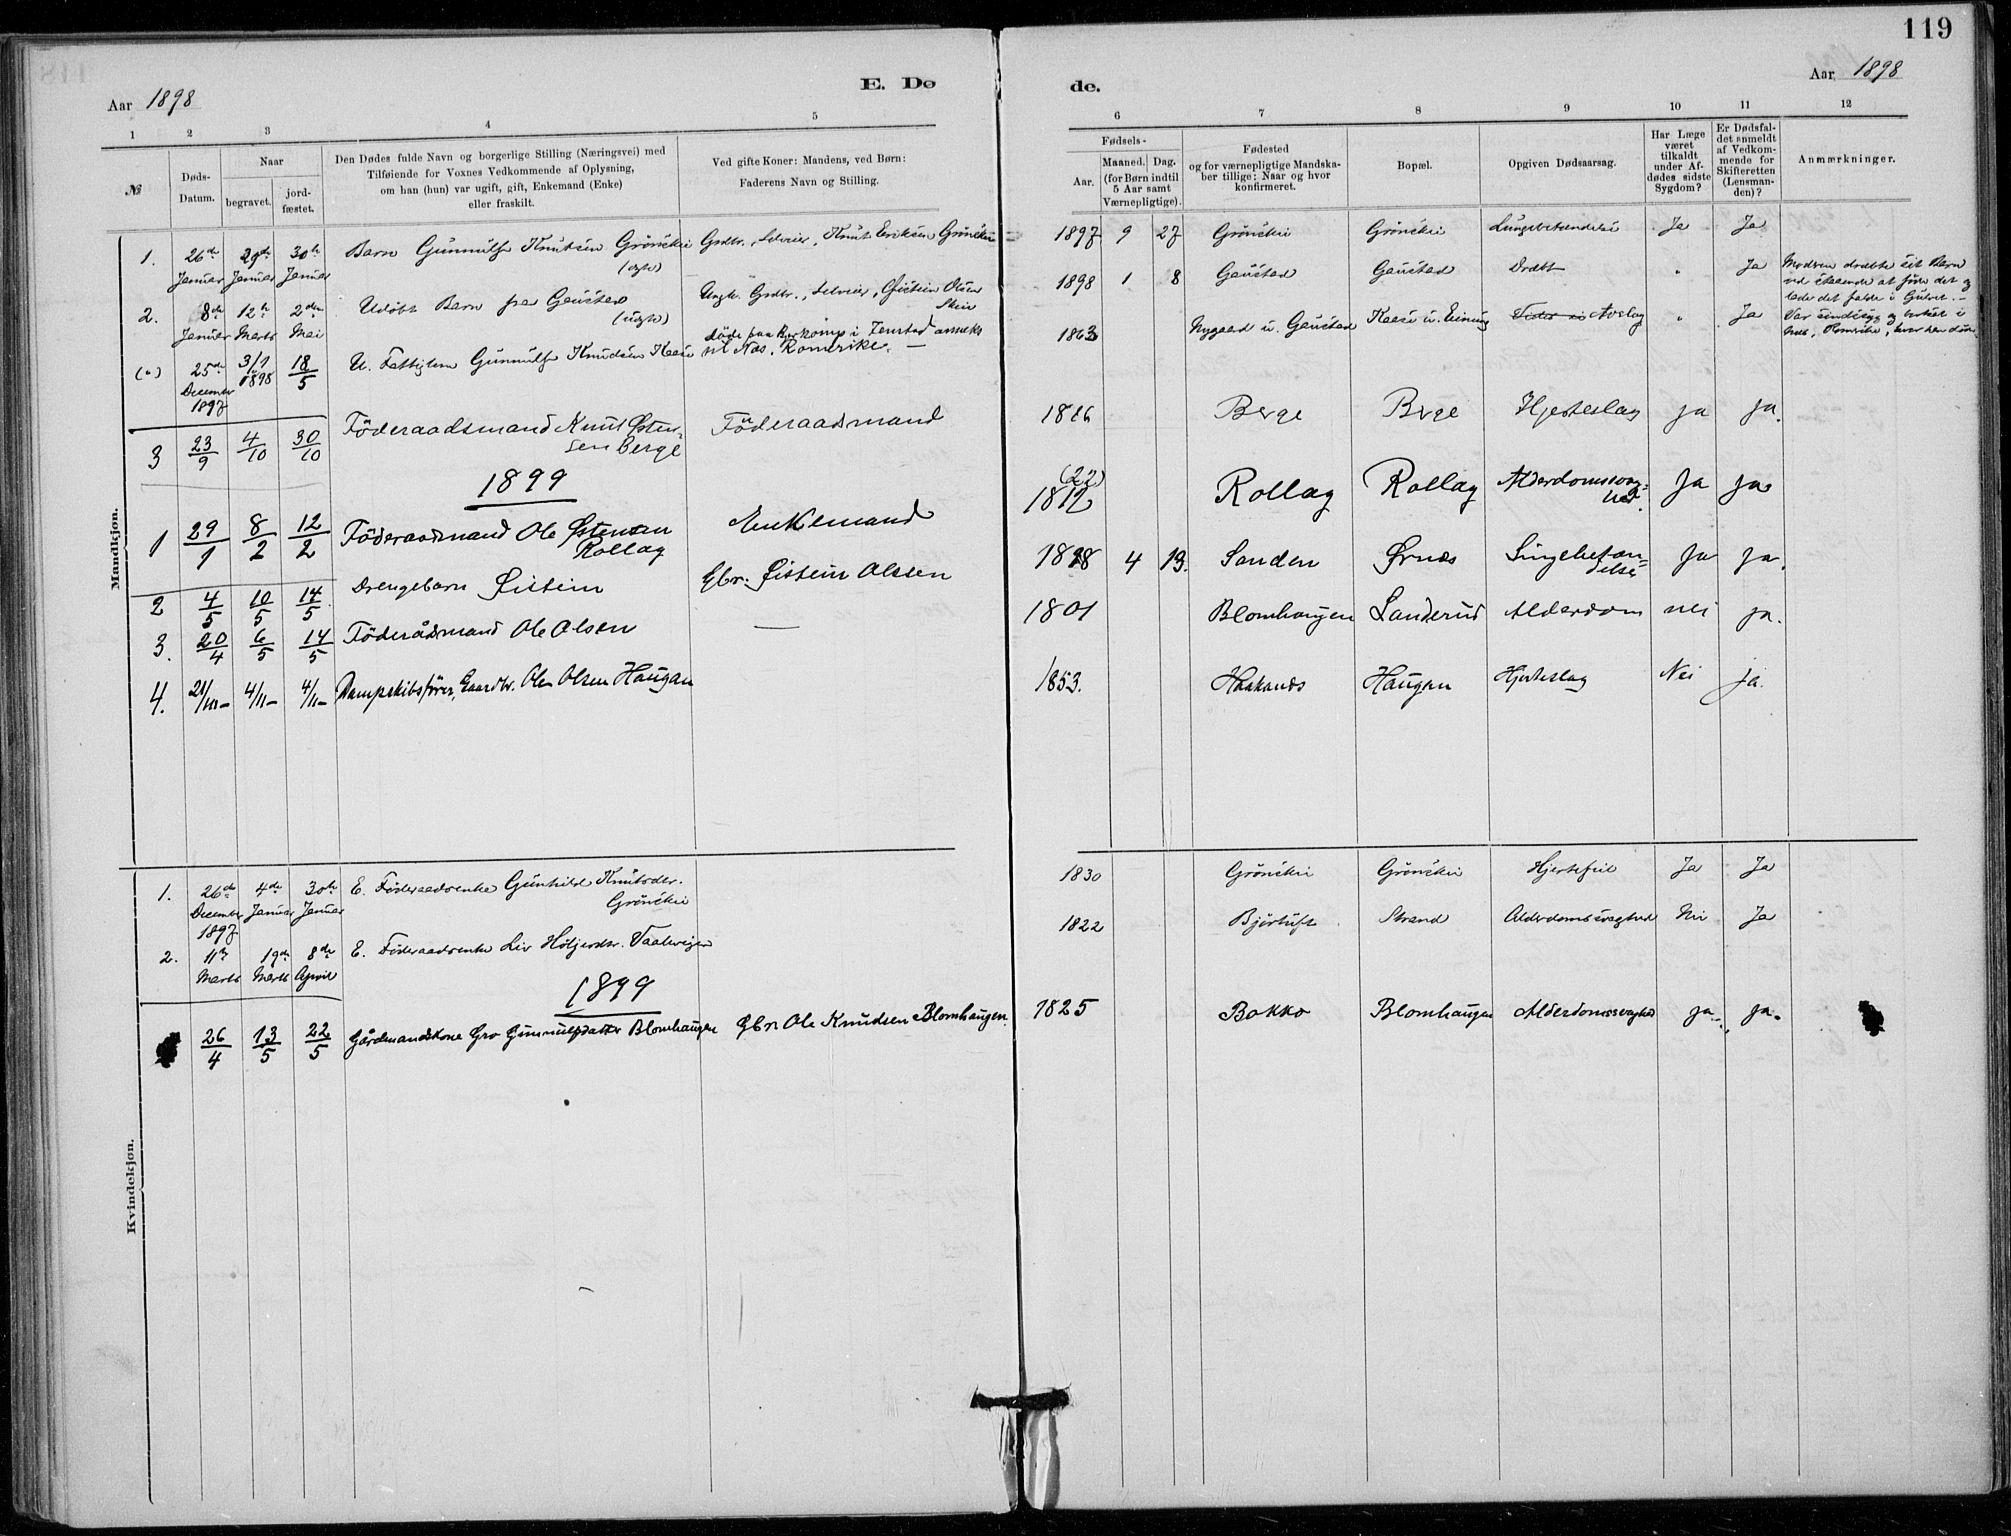 SAKO, Tinn kirkebøker, F/Fb/L0002: Ministerialbok nr. II 2, 1878-1917, s. 119